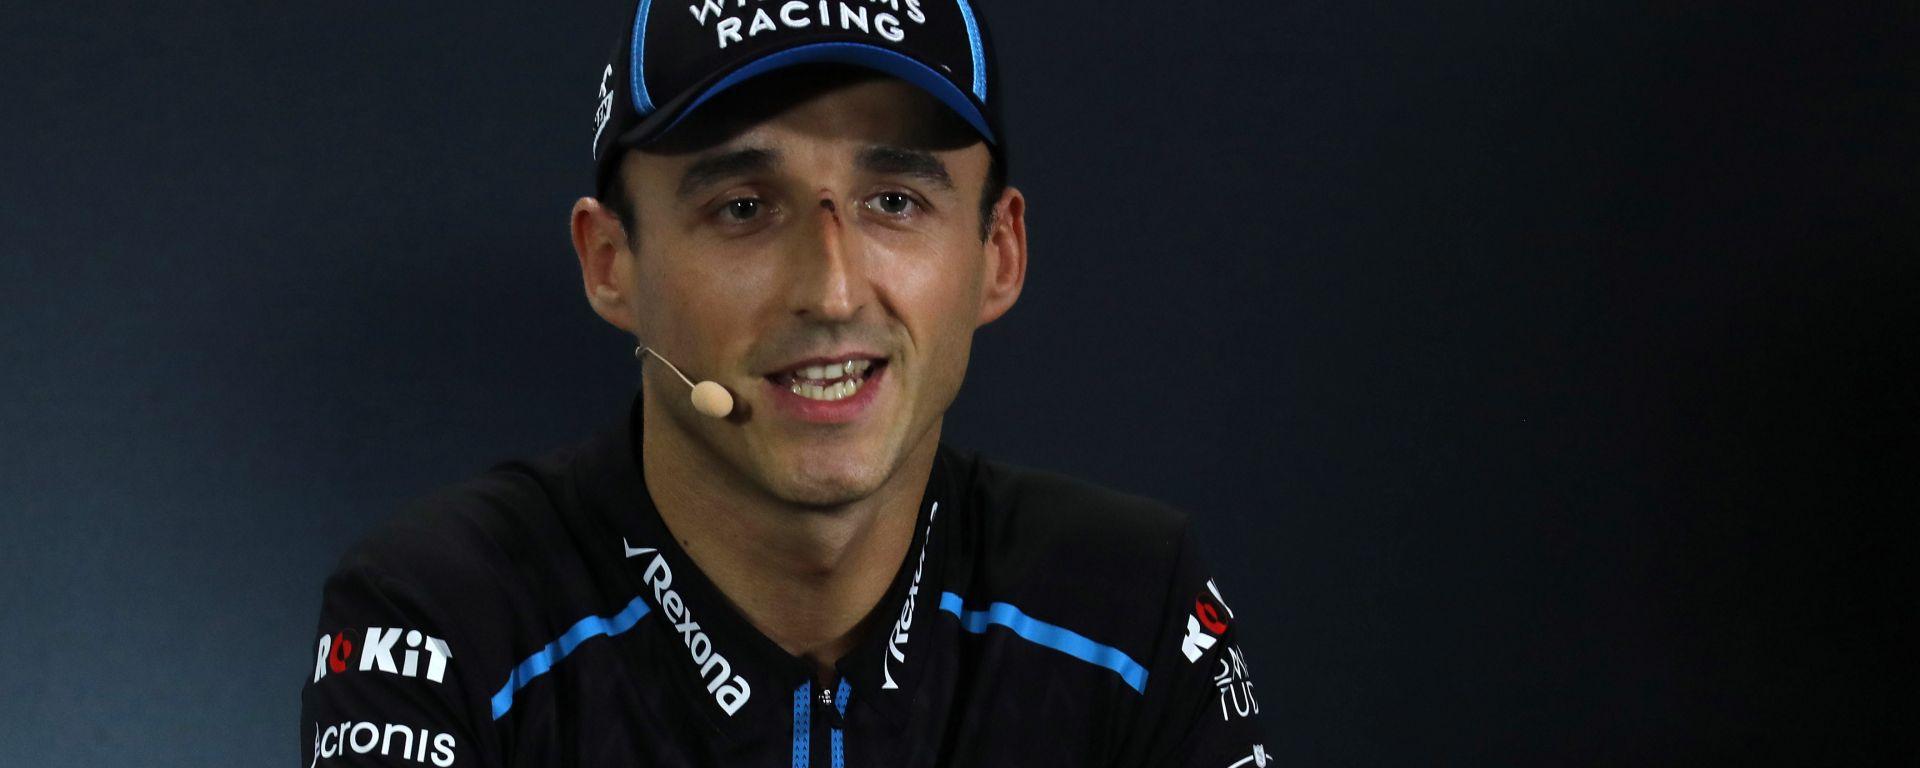 F1 GP Singapore 2019, Robert Kubica (Williams)